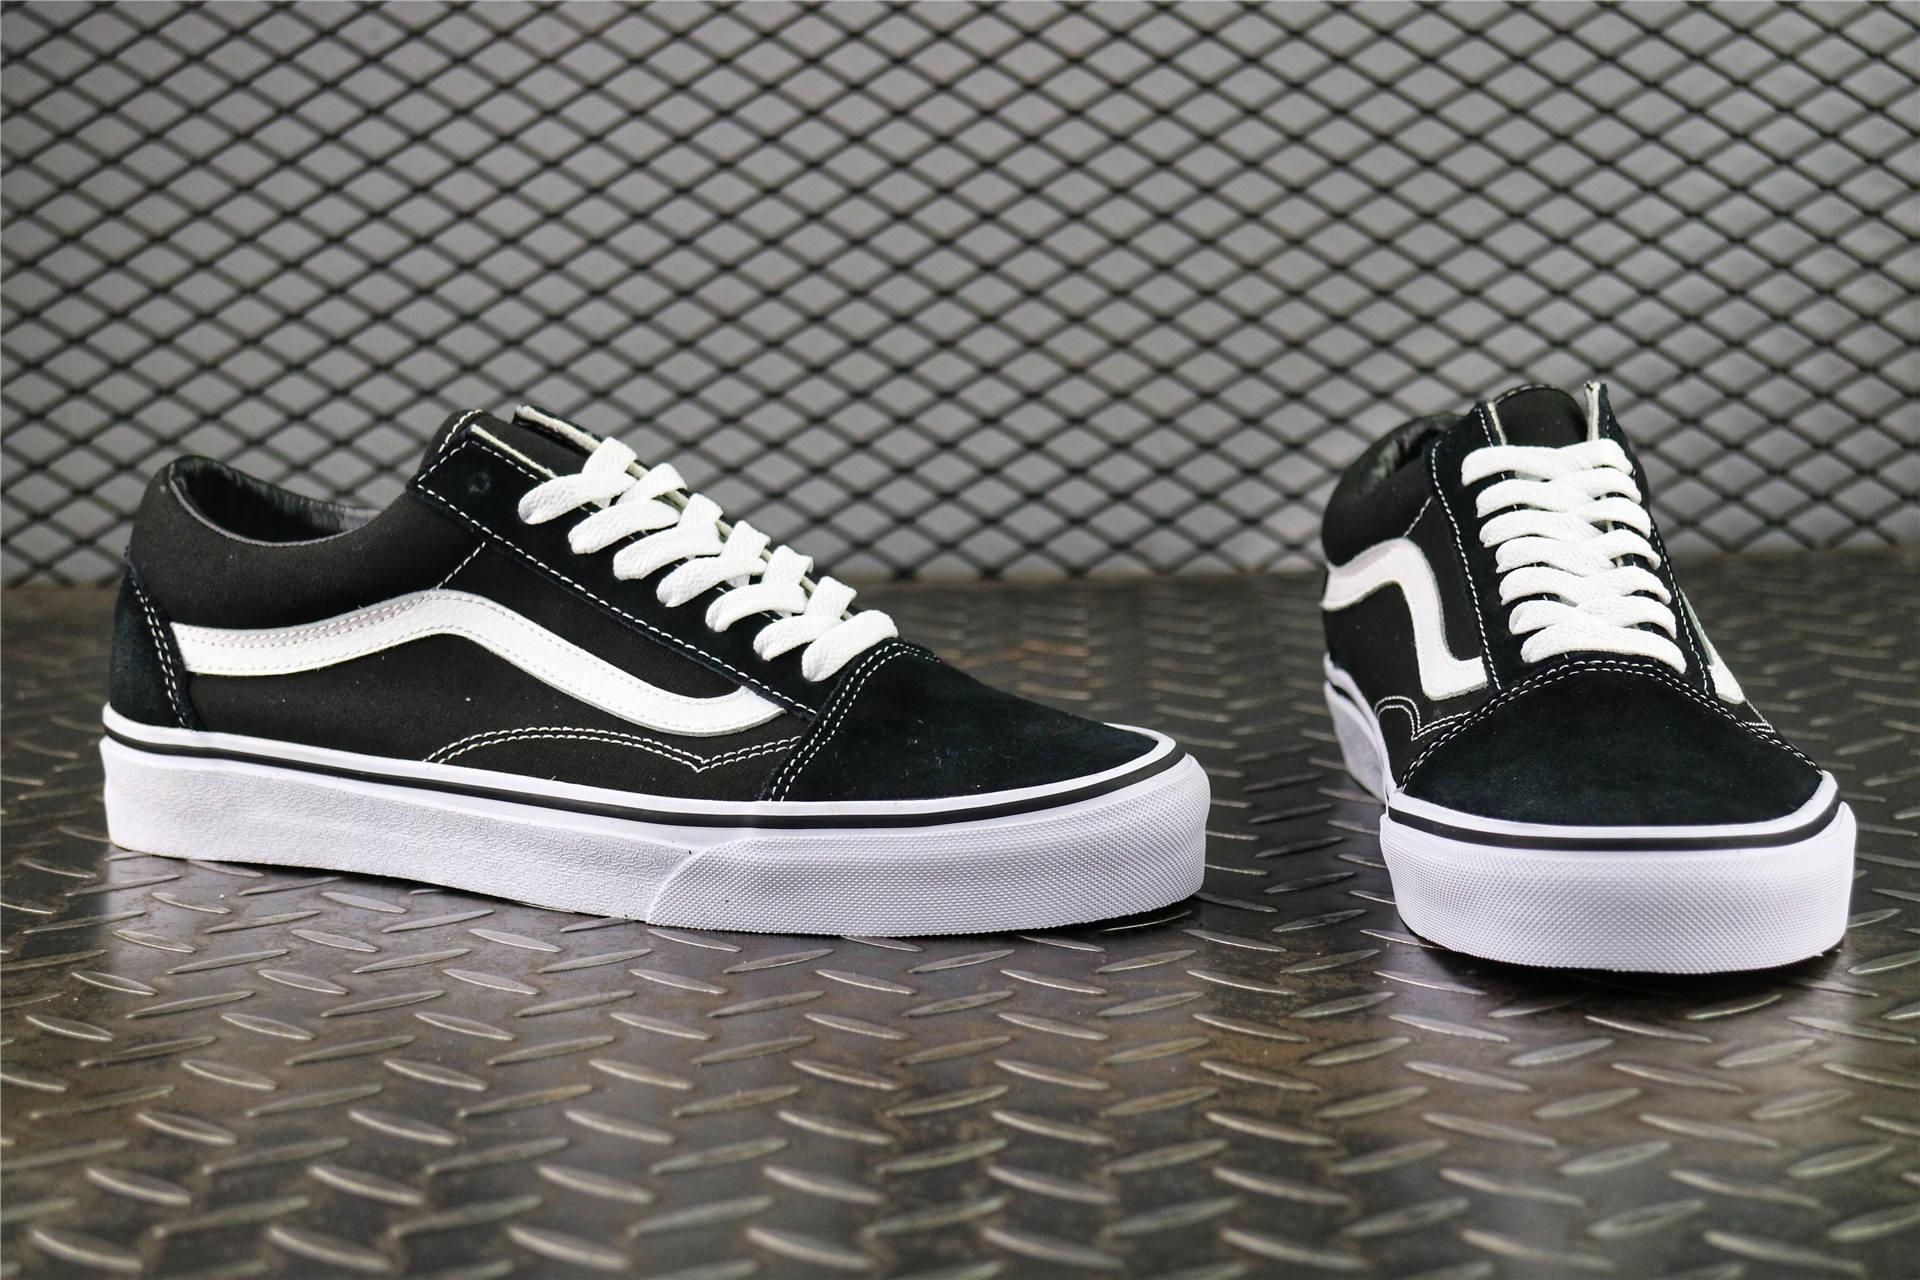 f48c29a286be Купить мужские кеды Vans Old Skool Black   White  Gum в интернет ...